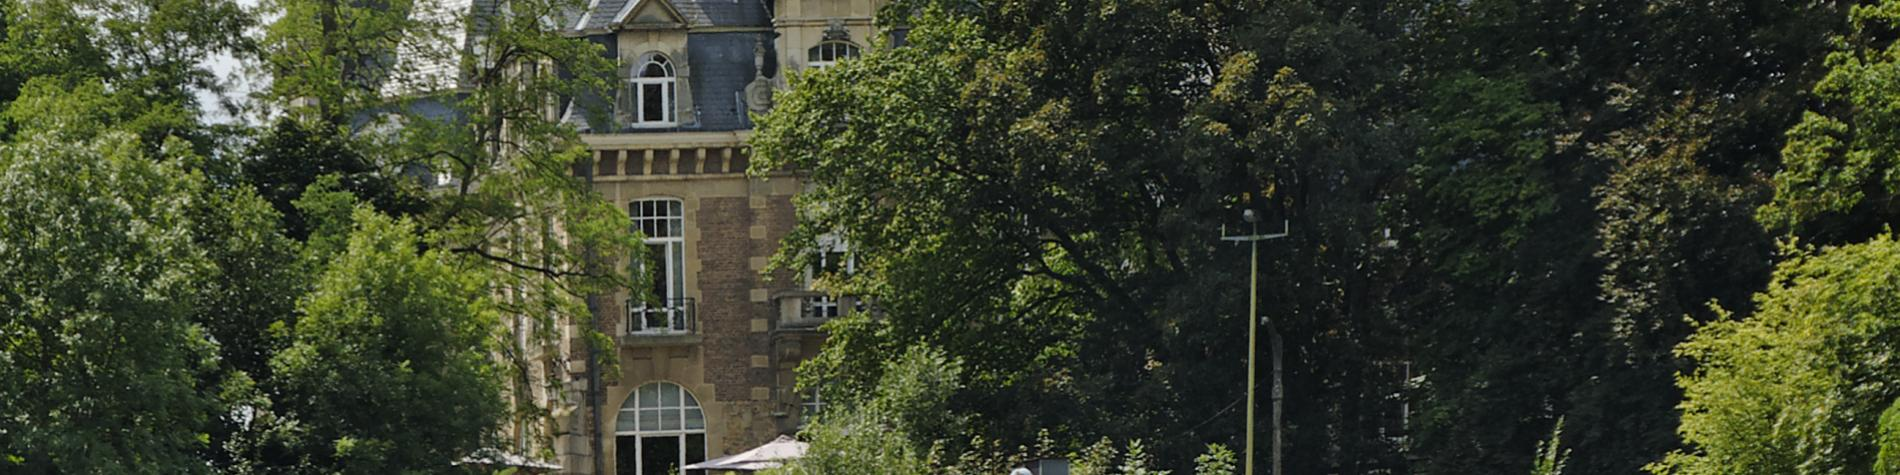 Château - Namur - arbres